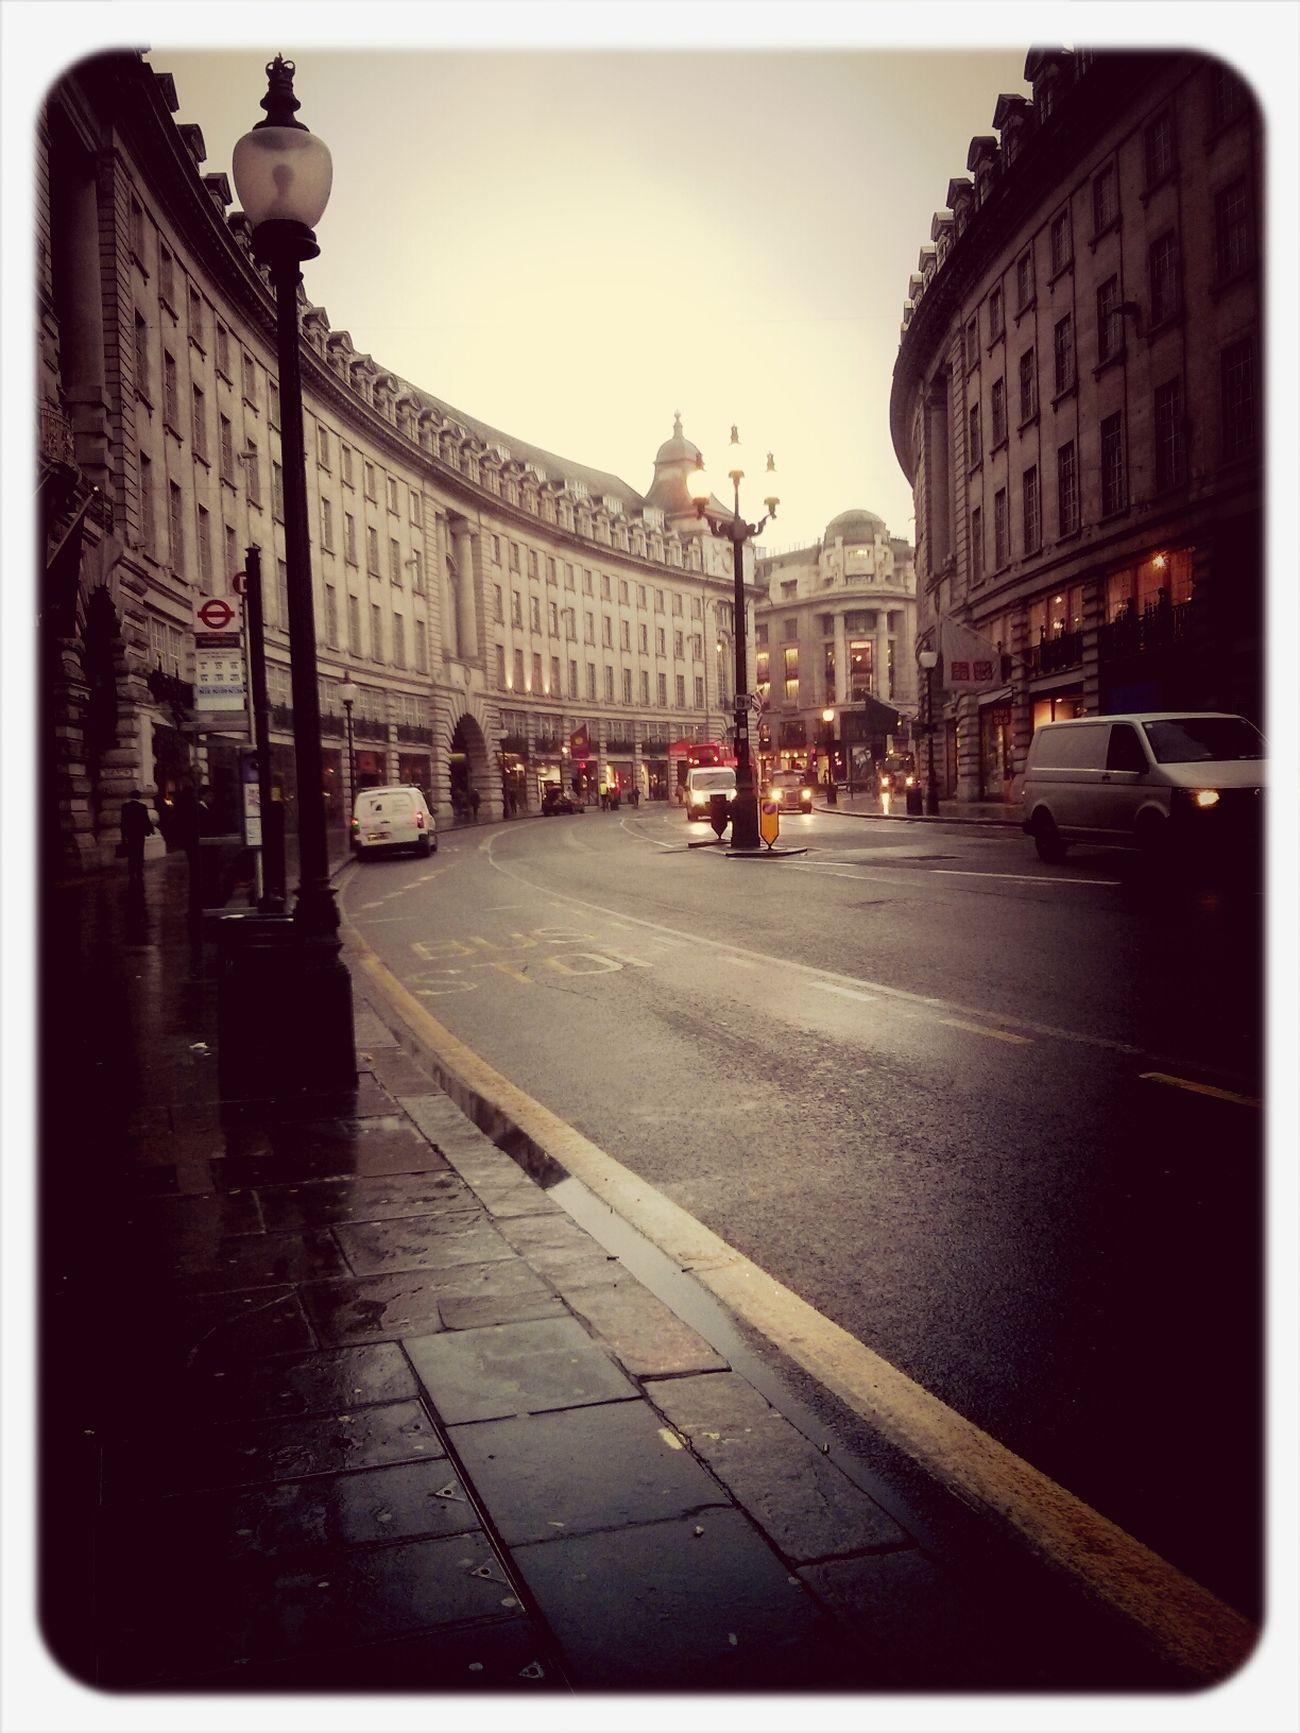 London Regentstreet Streetphotography